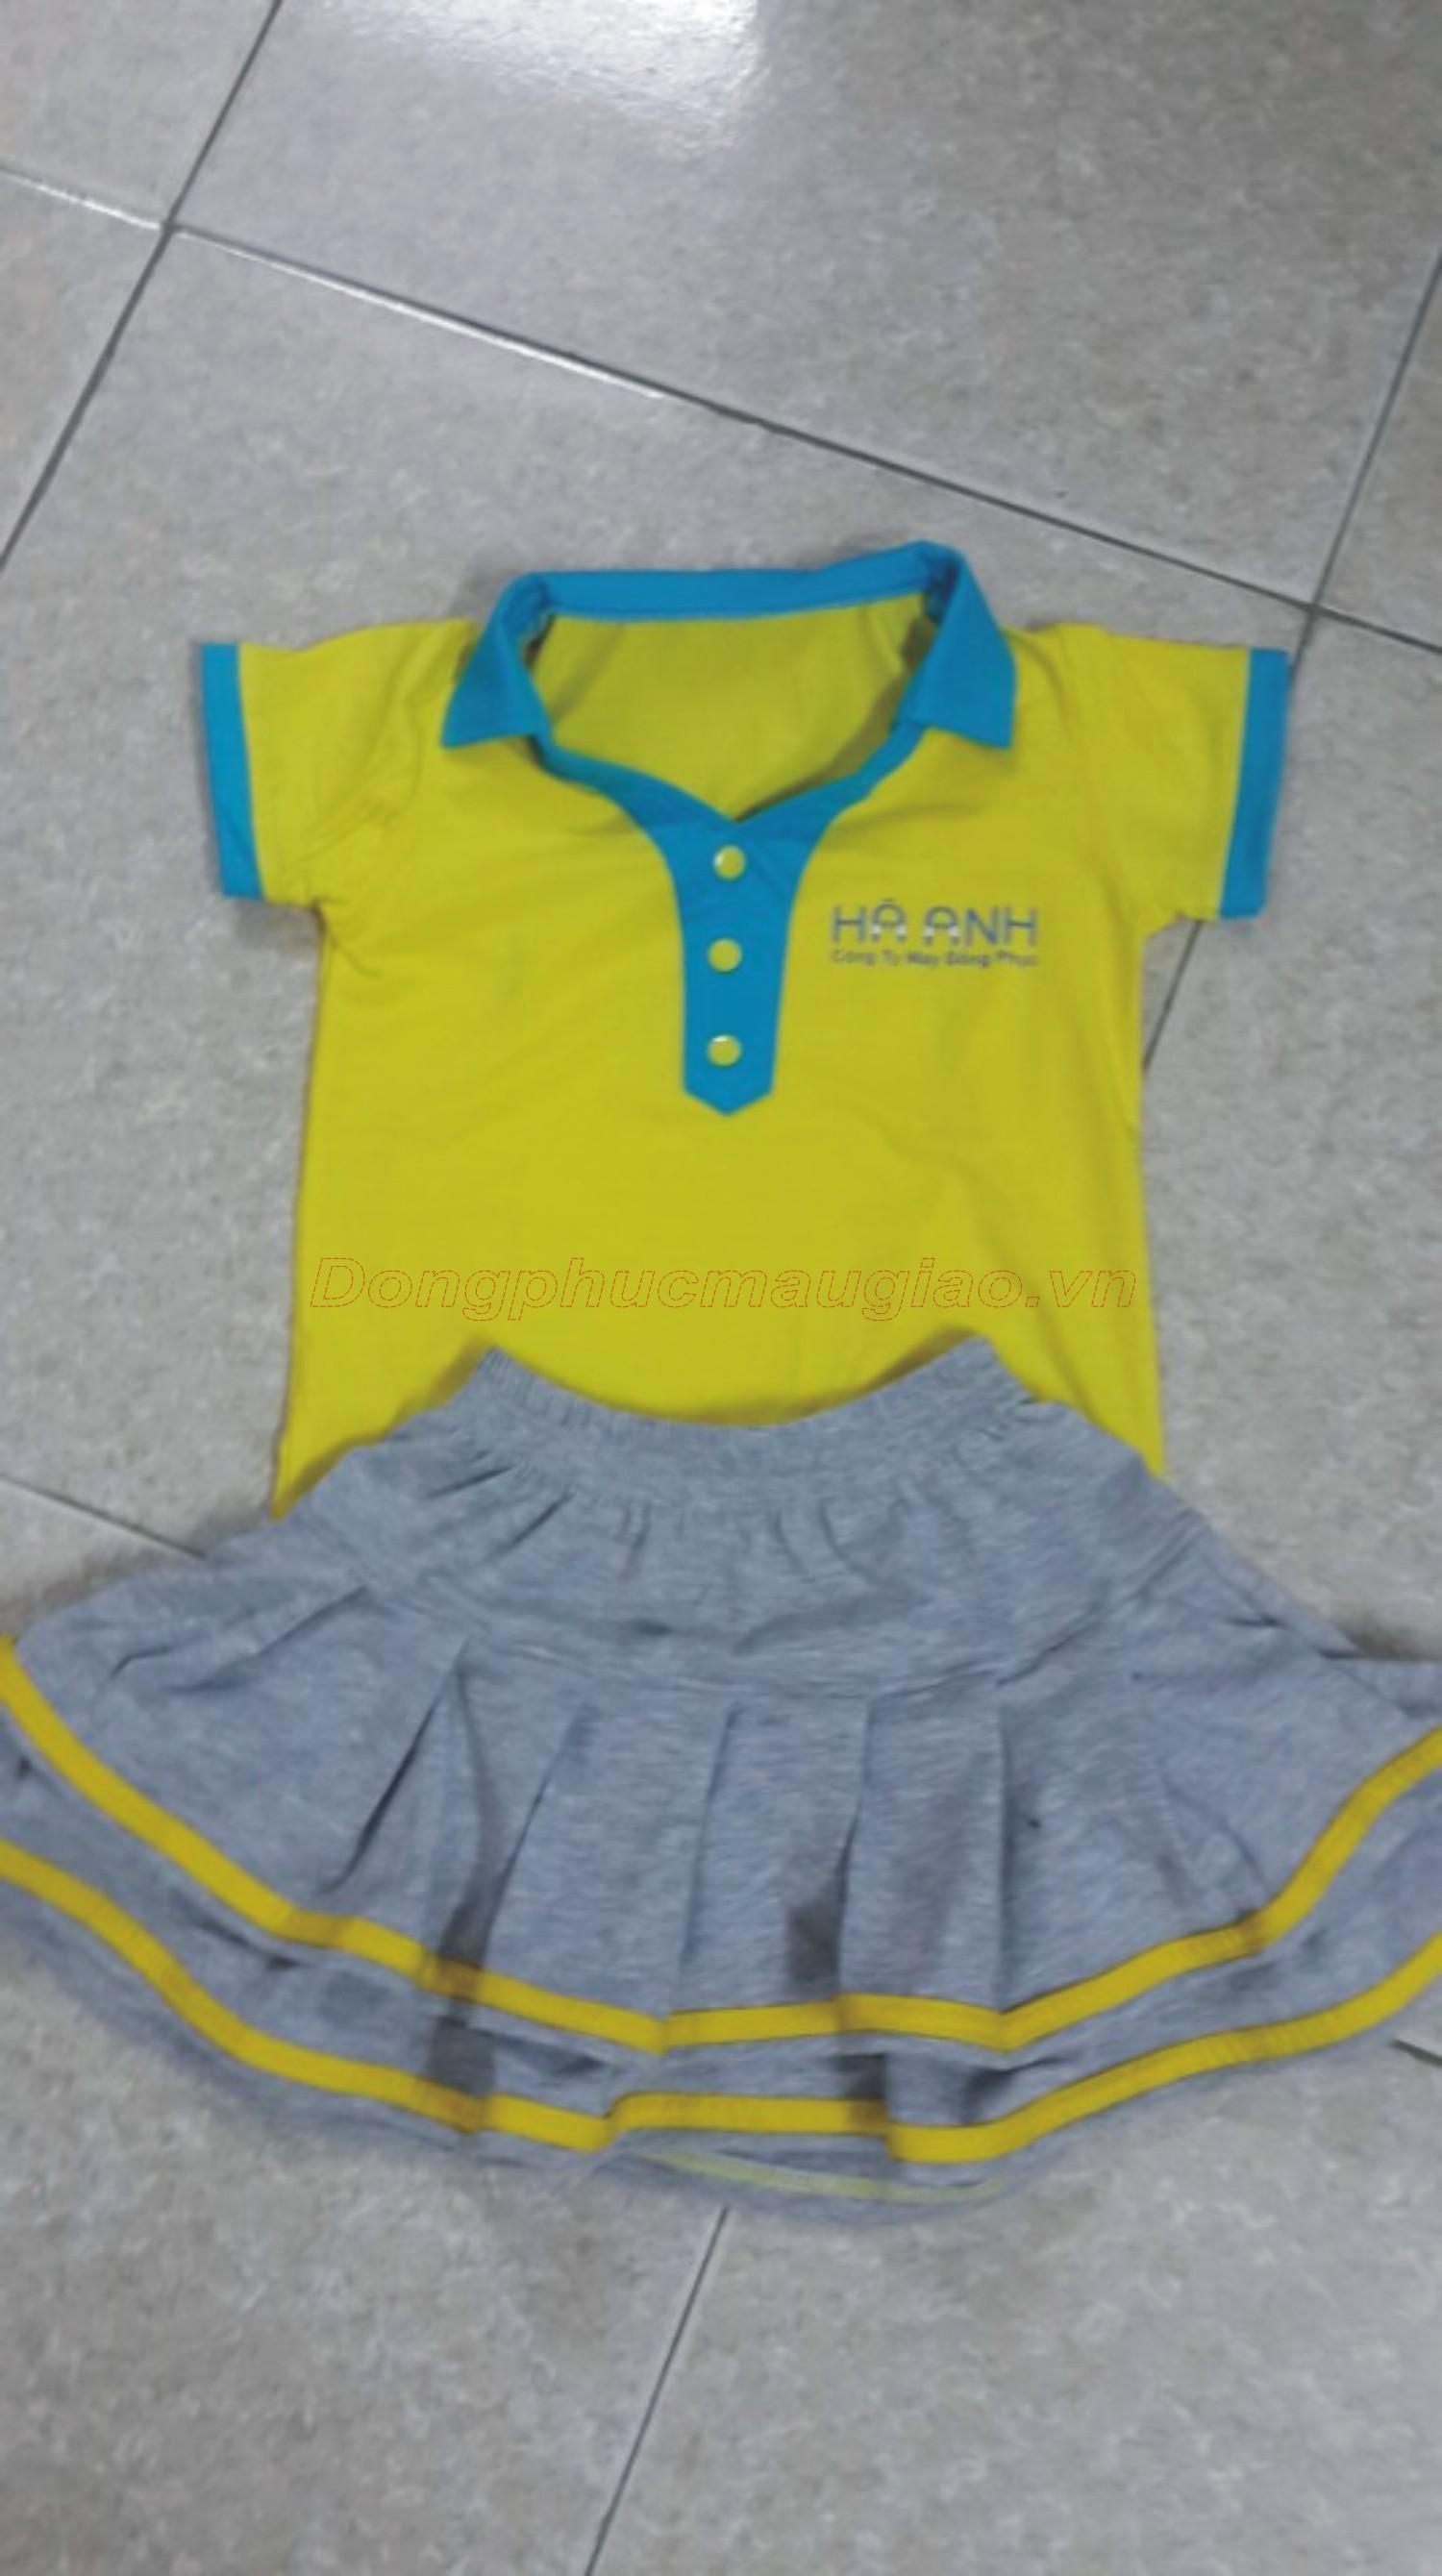 đồng phục mầm non